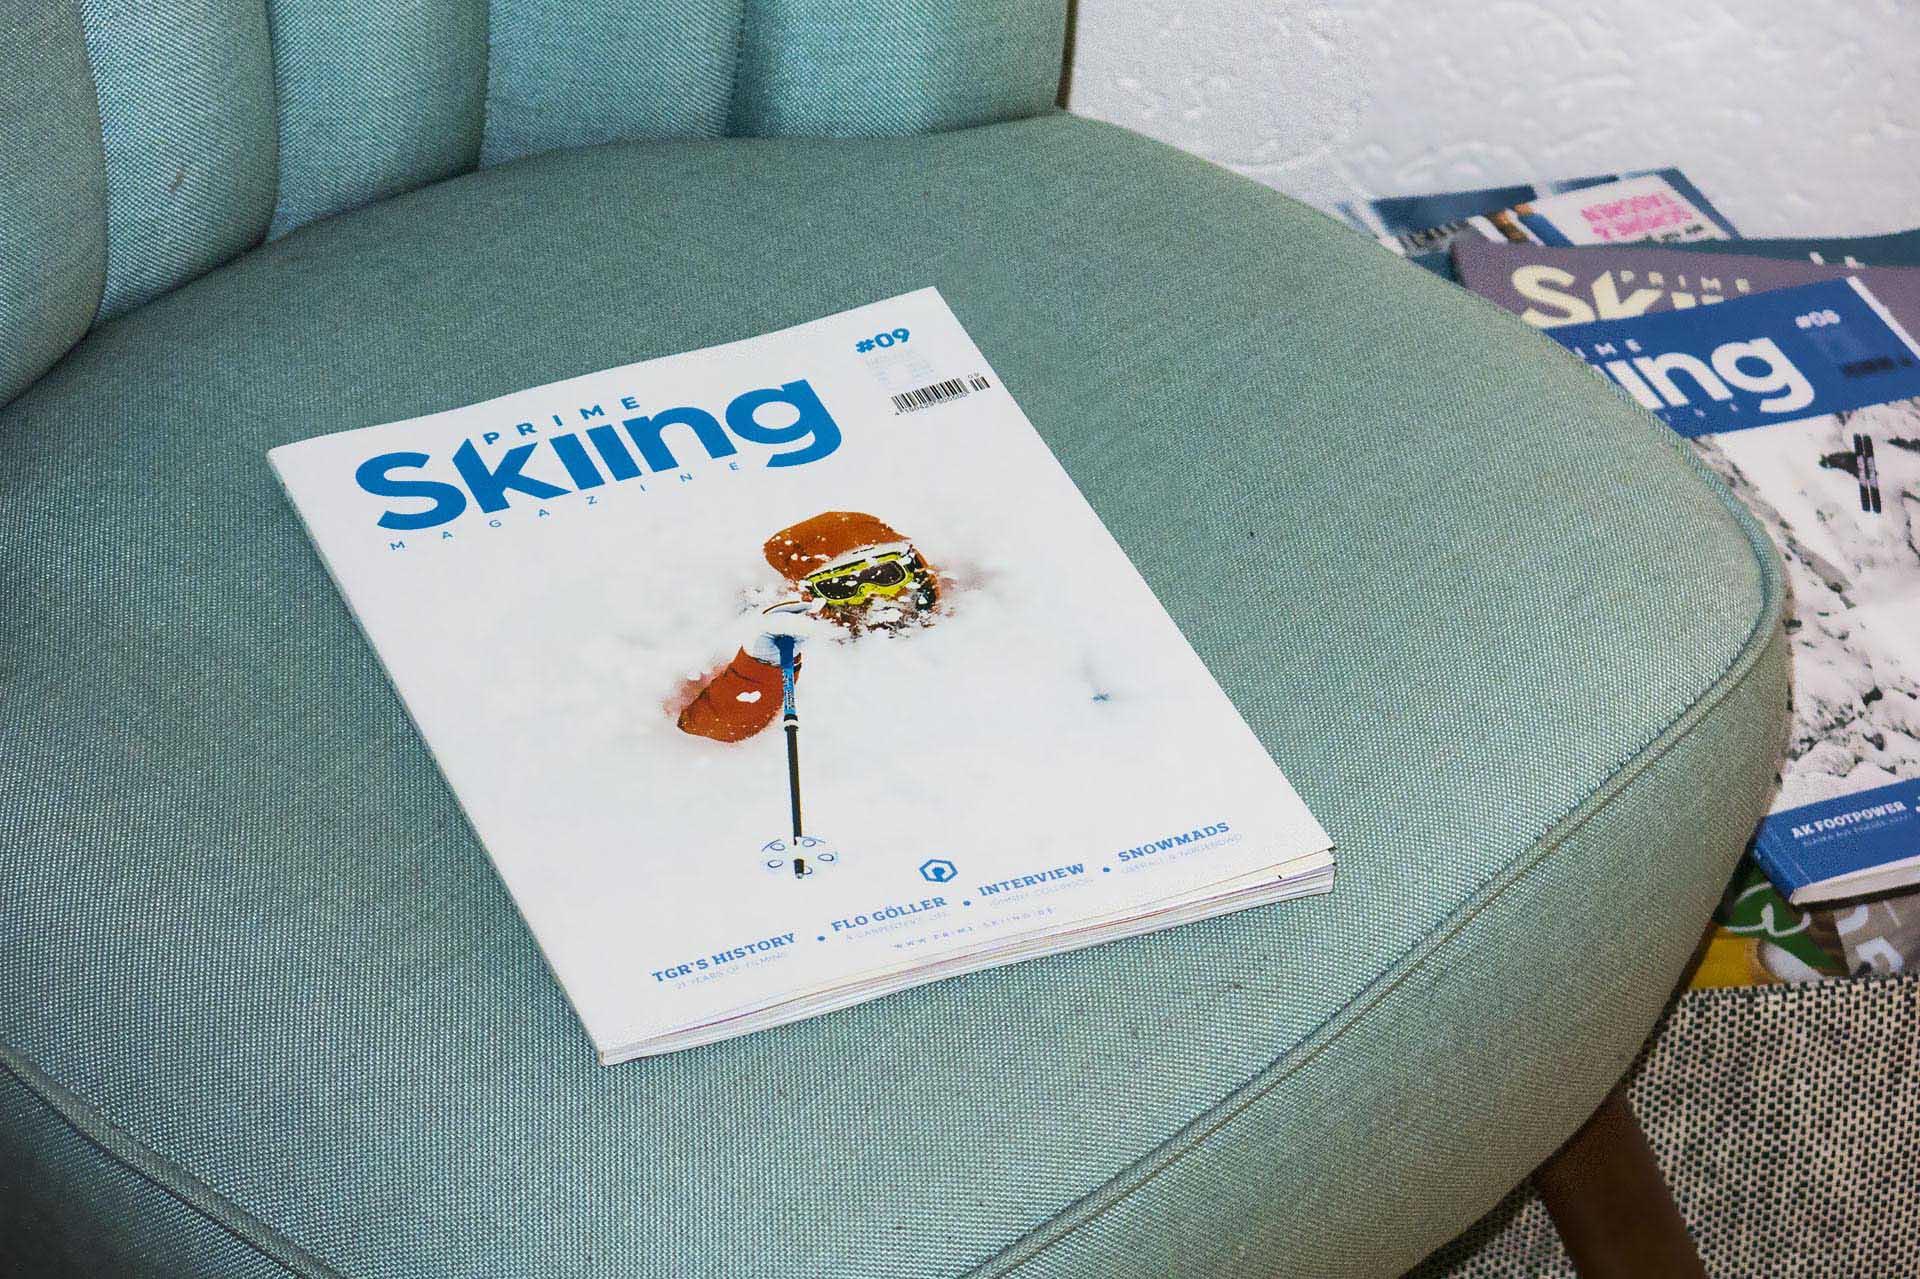 Prime Skiing #09